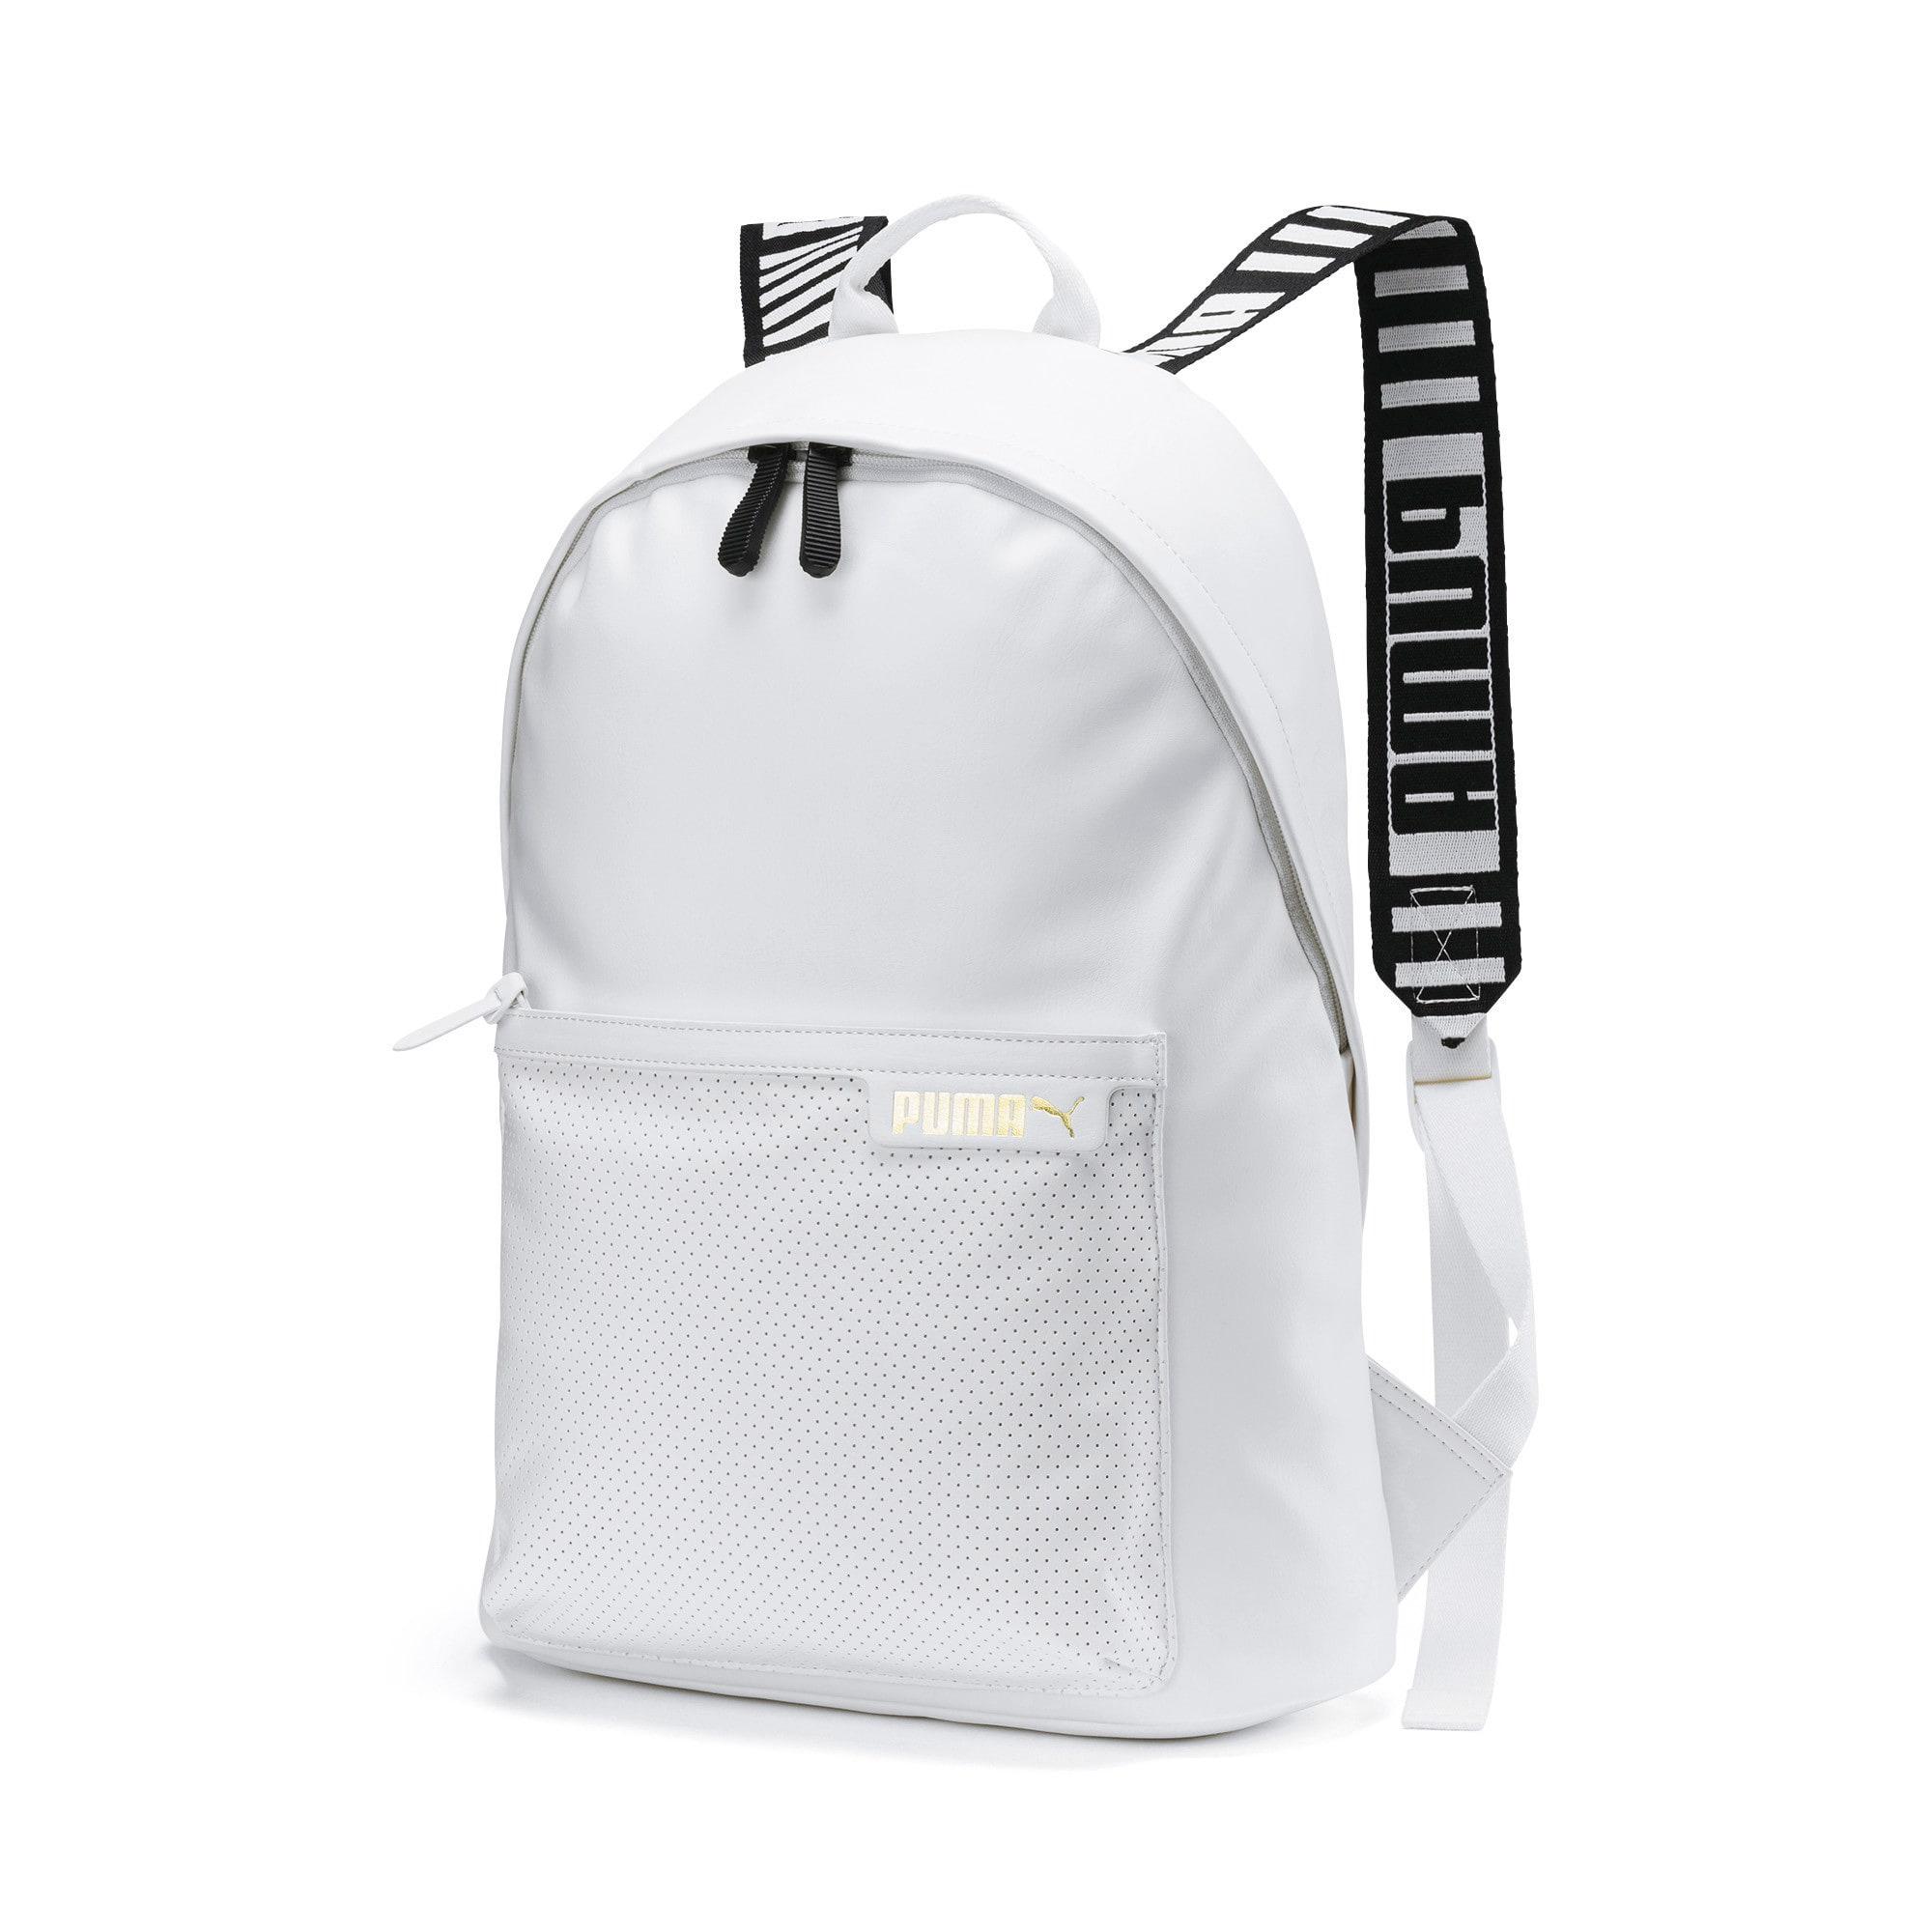 Thumbnail 1 of Prime Cali Women's Backpack, Puma White, medium